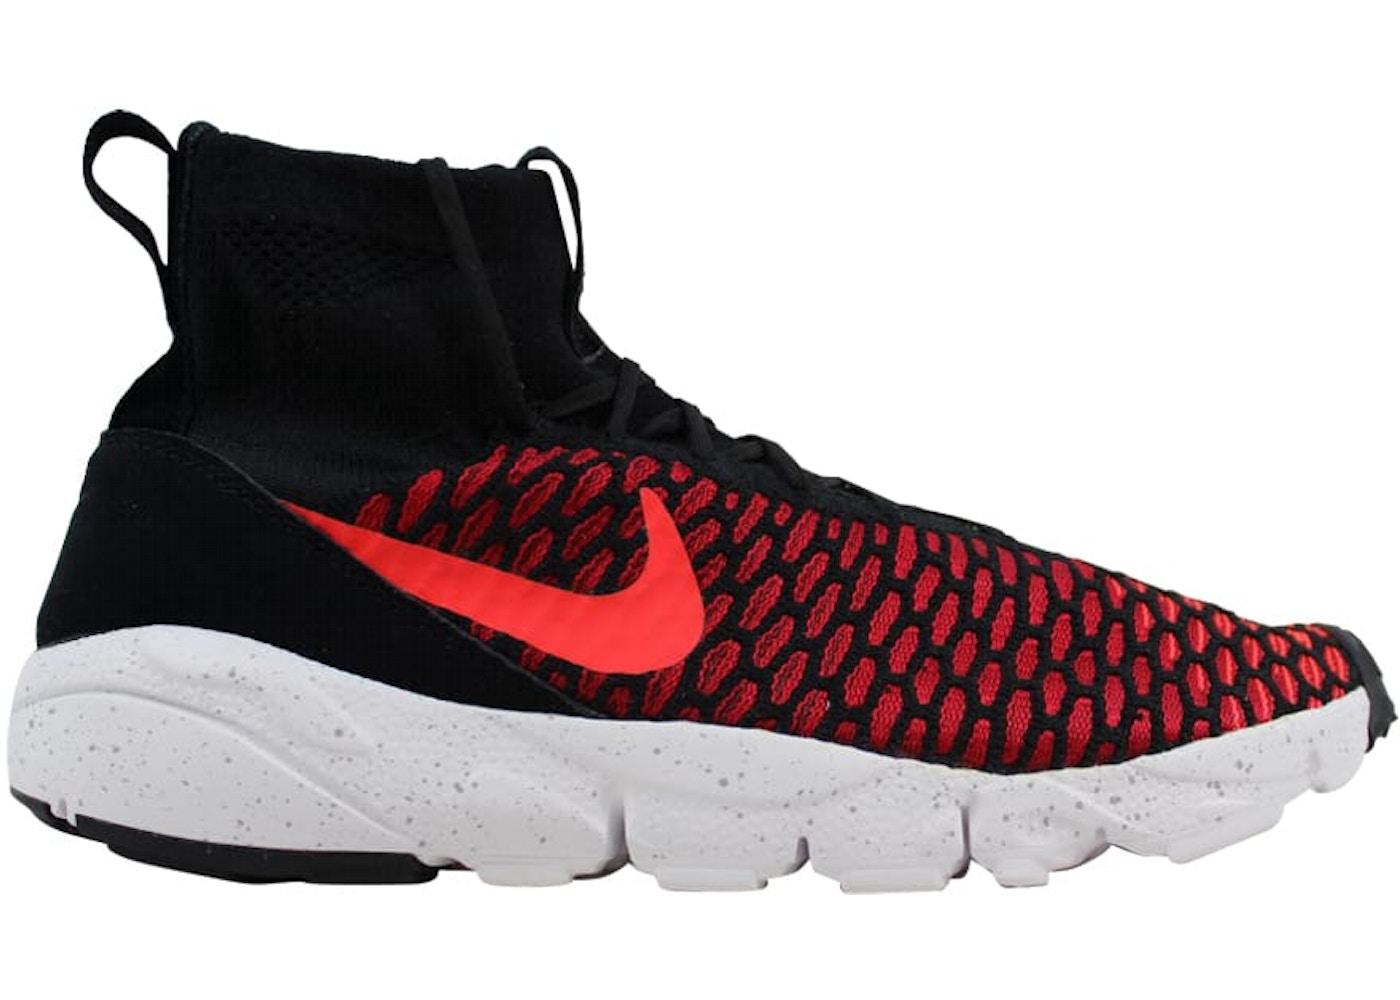 timeless design 3cec9 02de7 Nike Air Footscape Magista Flyknit Black Bright Crimson-Gym Red-Cool Grey